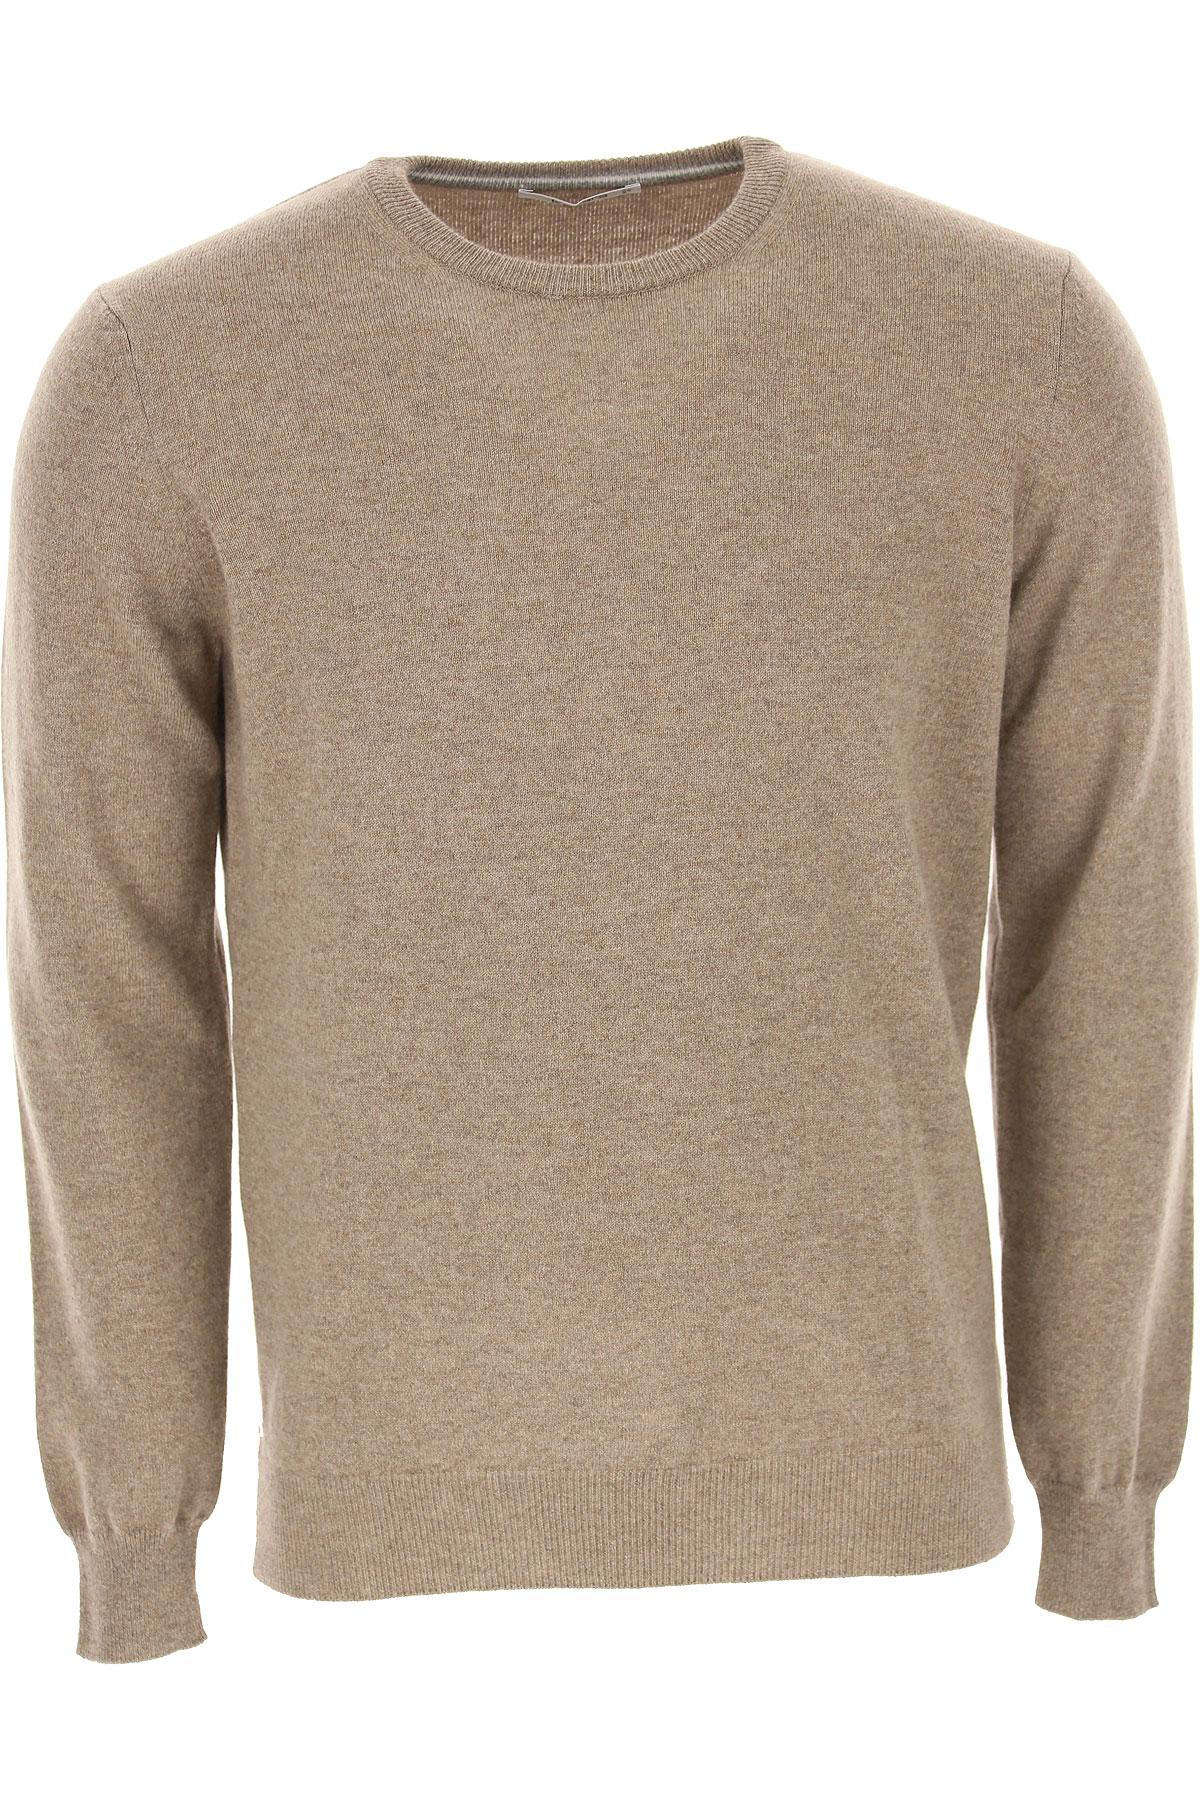 Kangra Sweater for Men Jumper On Sale, Tortoise, Cashemere, 2019, XL XXL